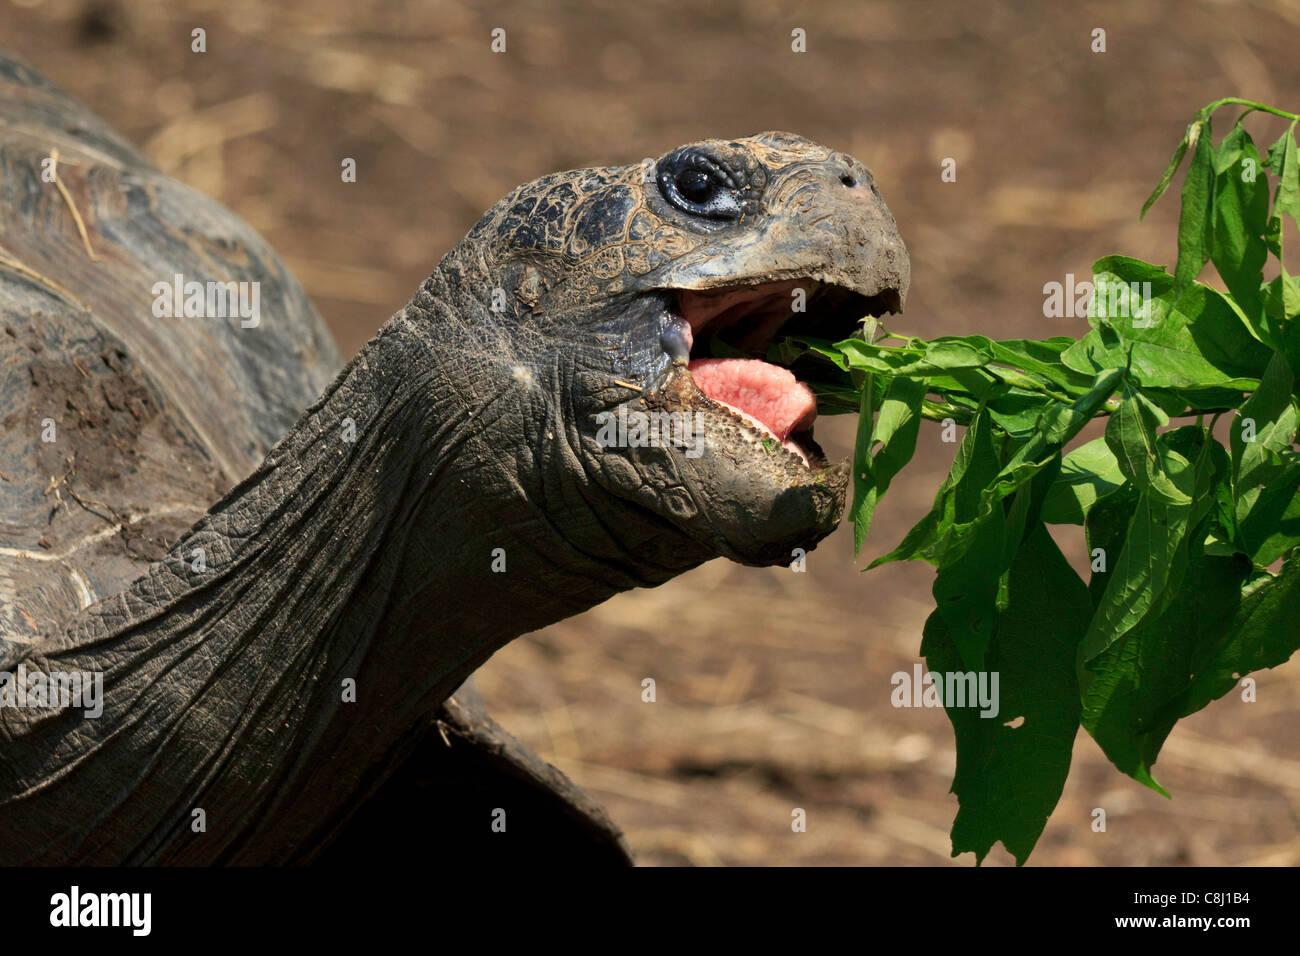 Animalia, Chordata, Dallas Zoo, Galápagos tortoise, geochelone nigra, Giant tortoise, largest living tortoise, - Stock Image